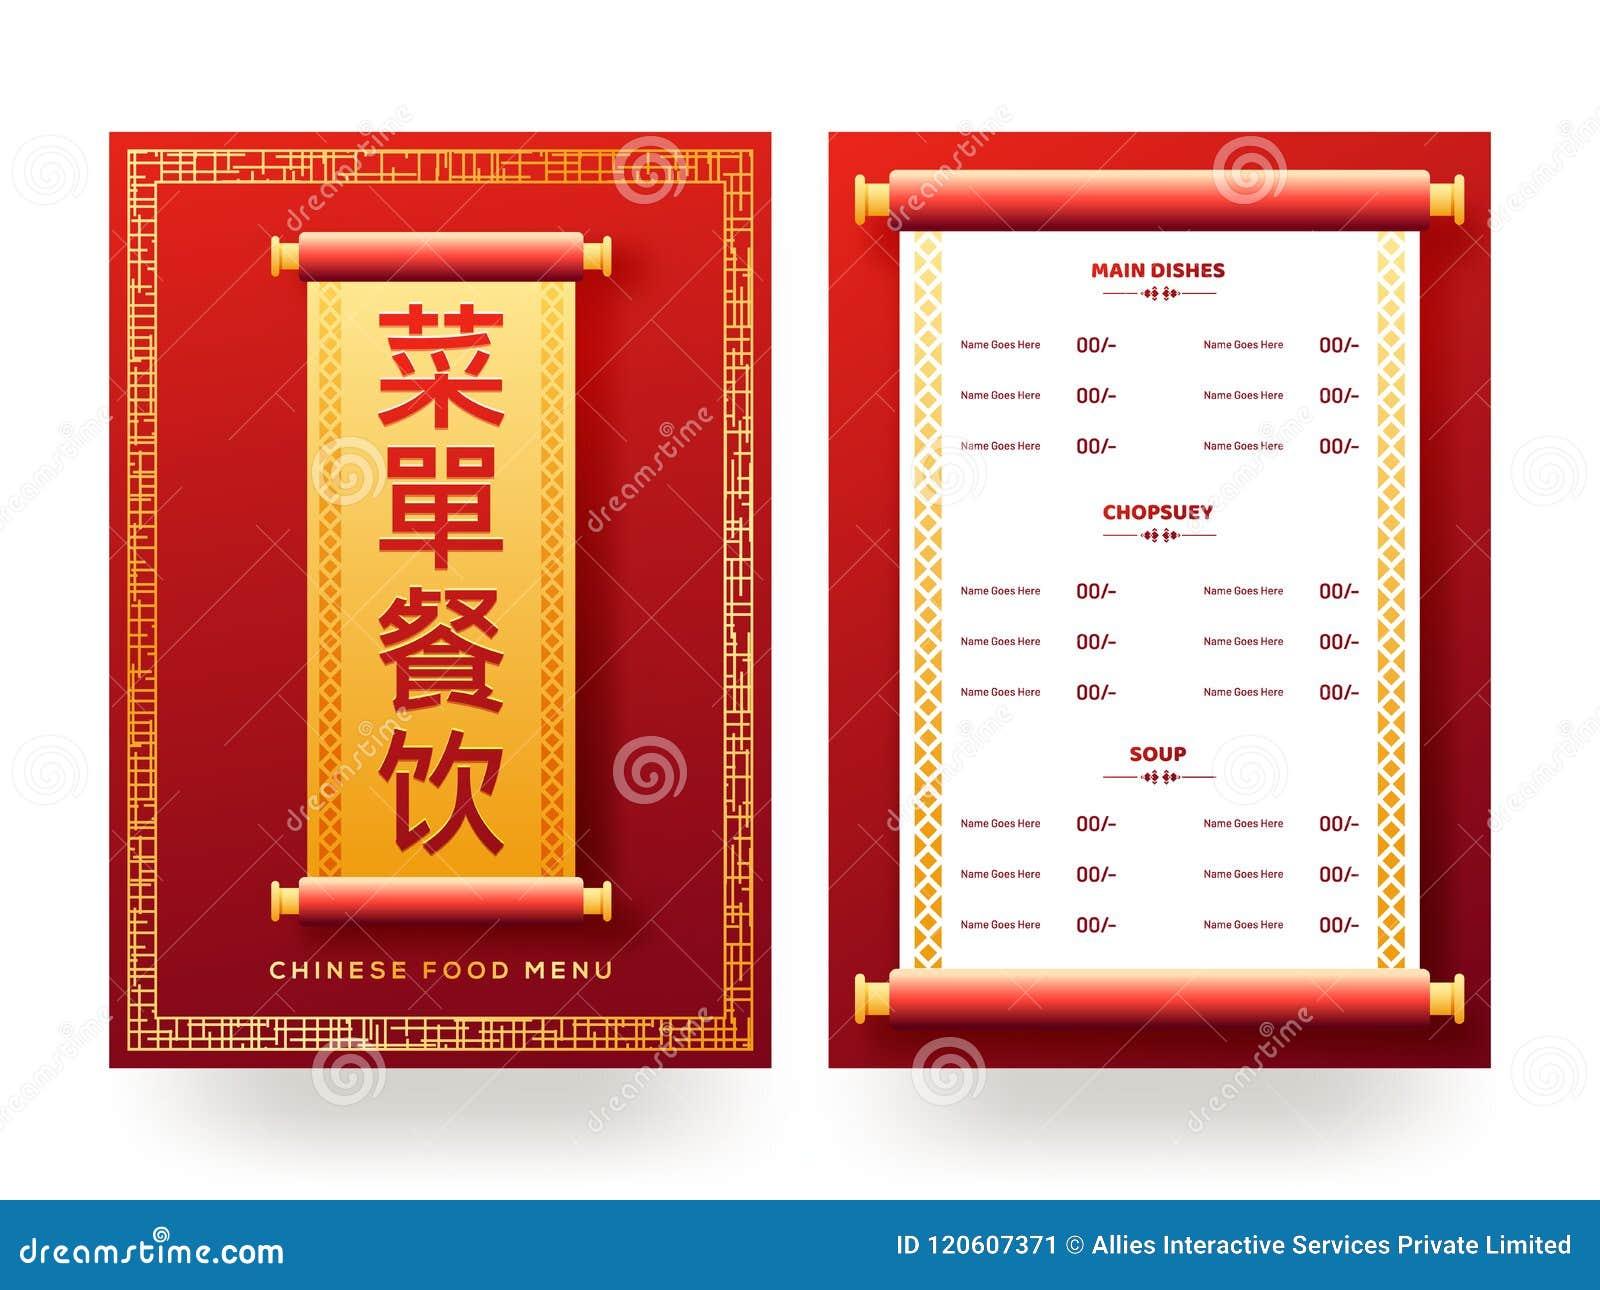 Chinese food menu card  stock illustration  Illustration of